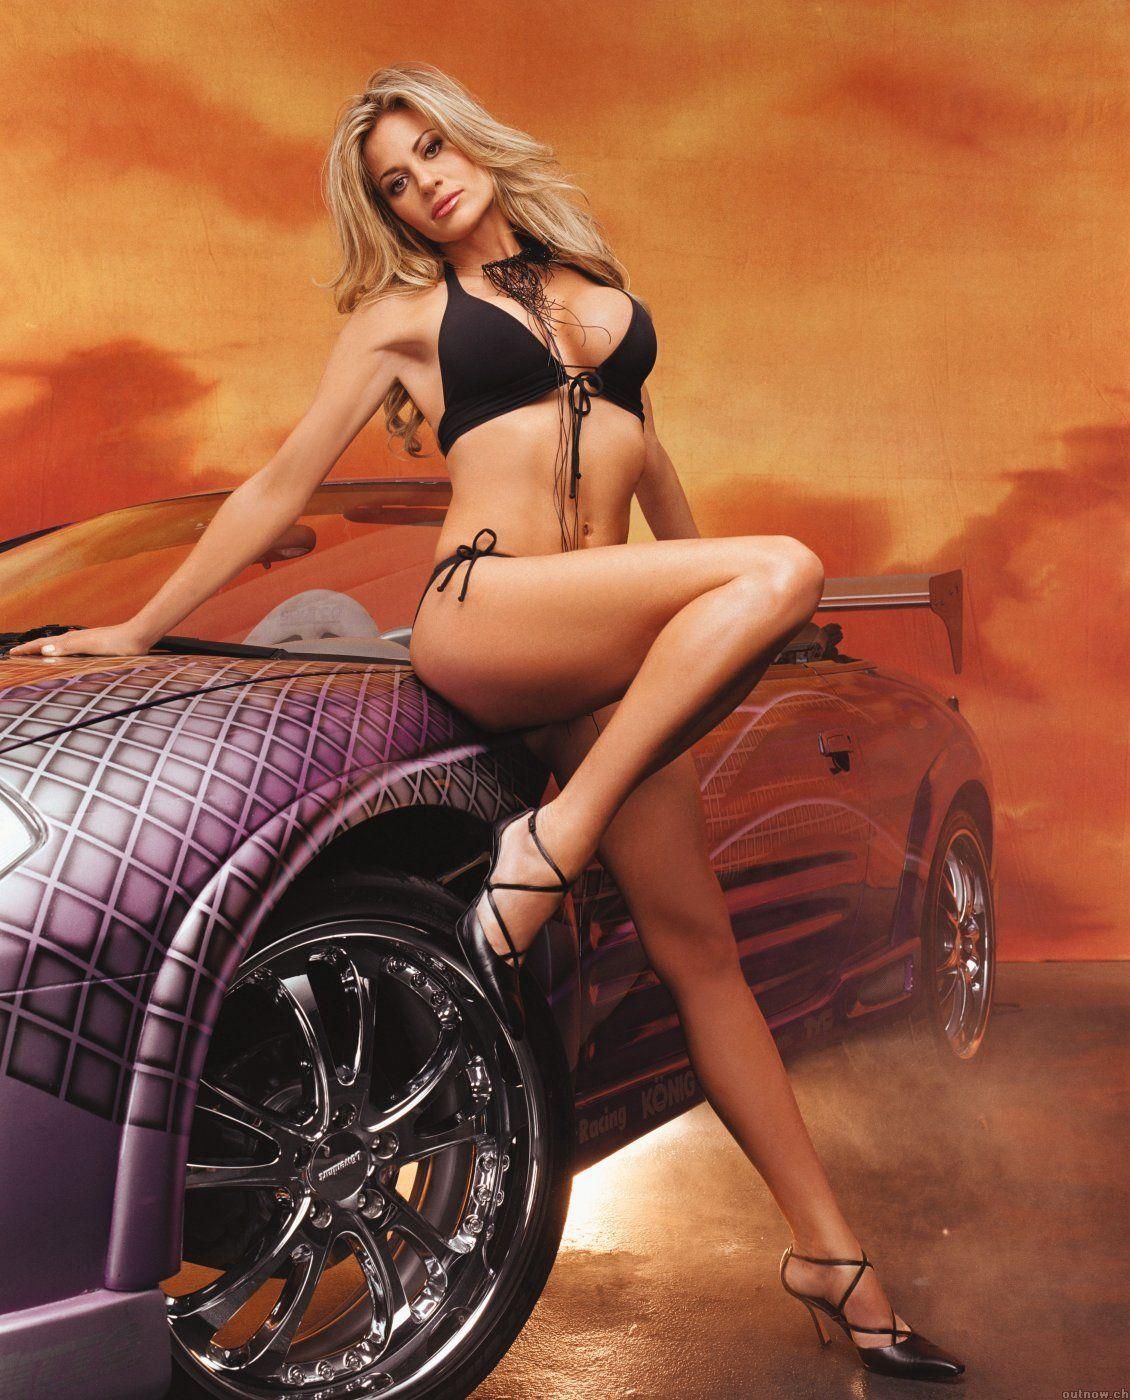 naked images of ashley tisdale